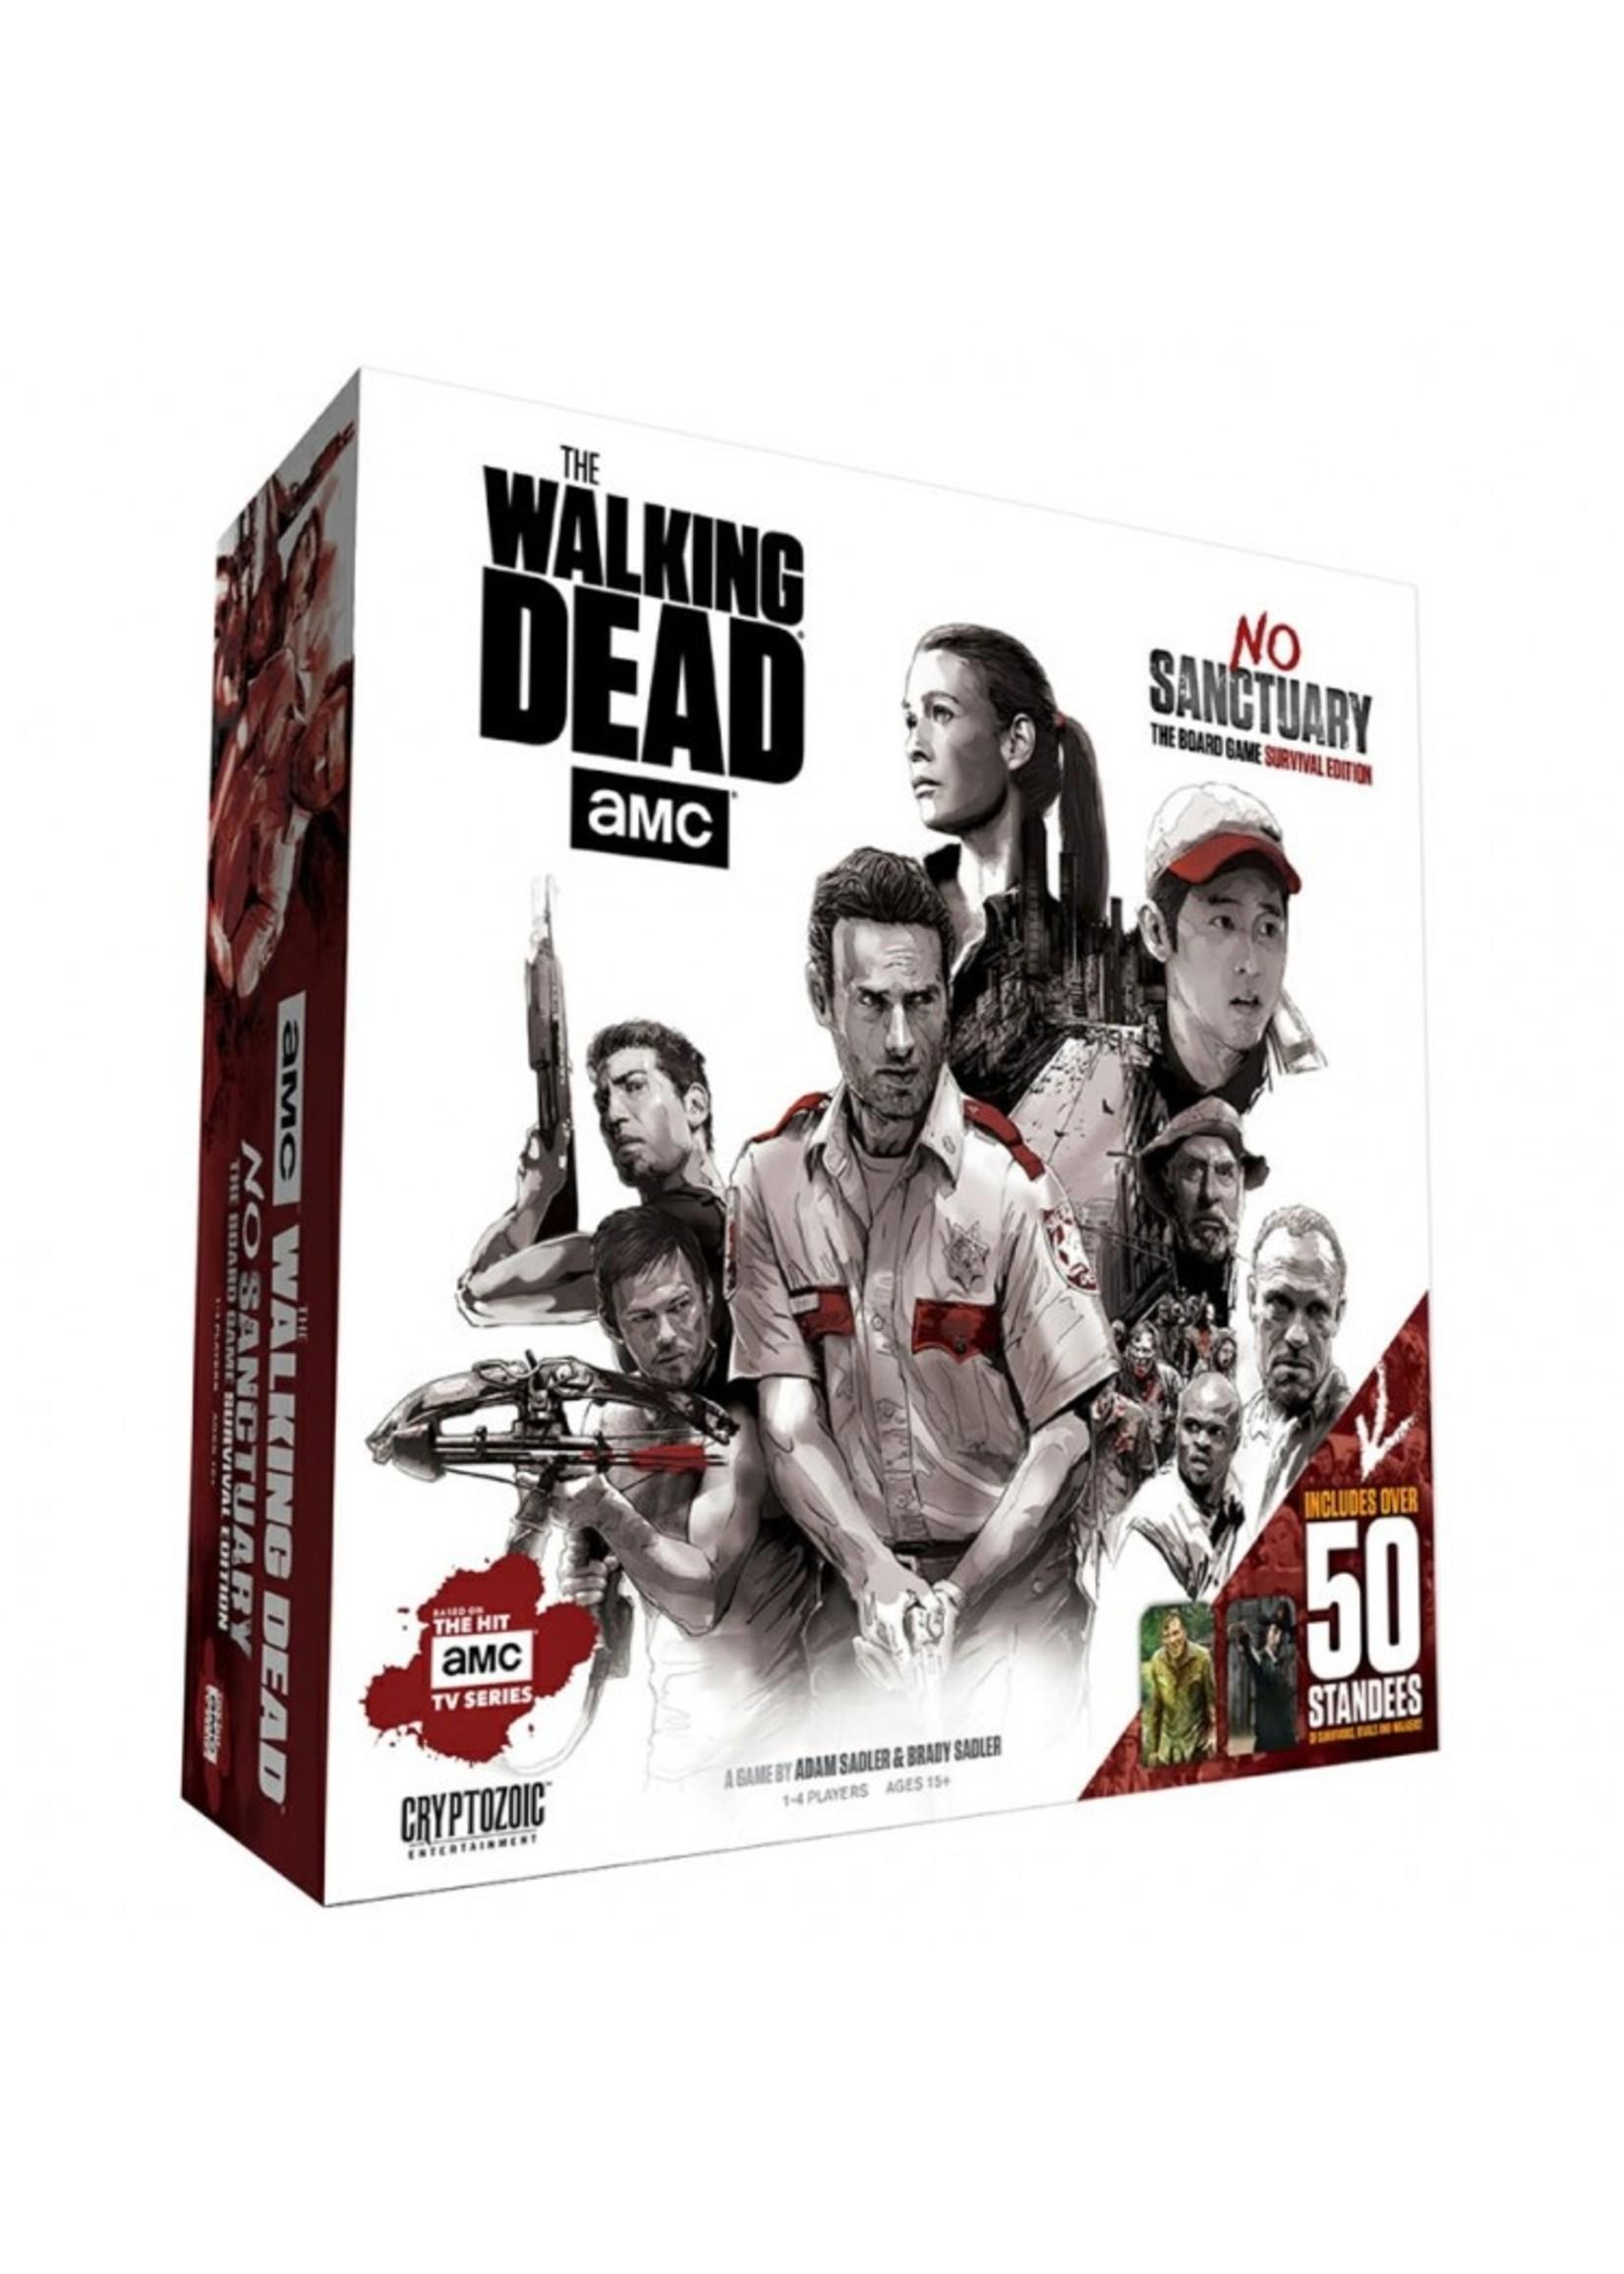 The Walking Dead No Sanctuary Game Survival Edition